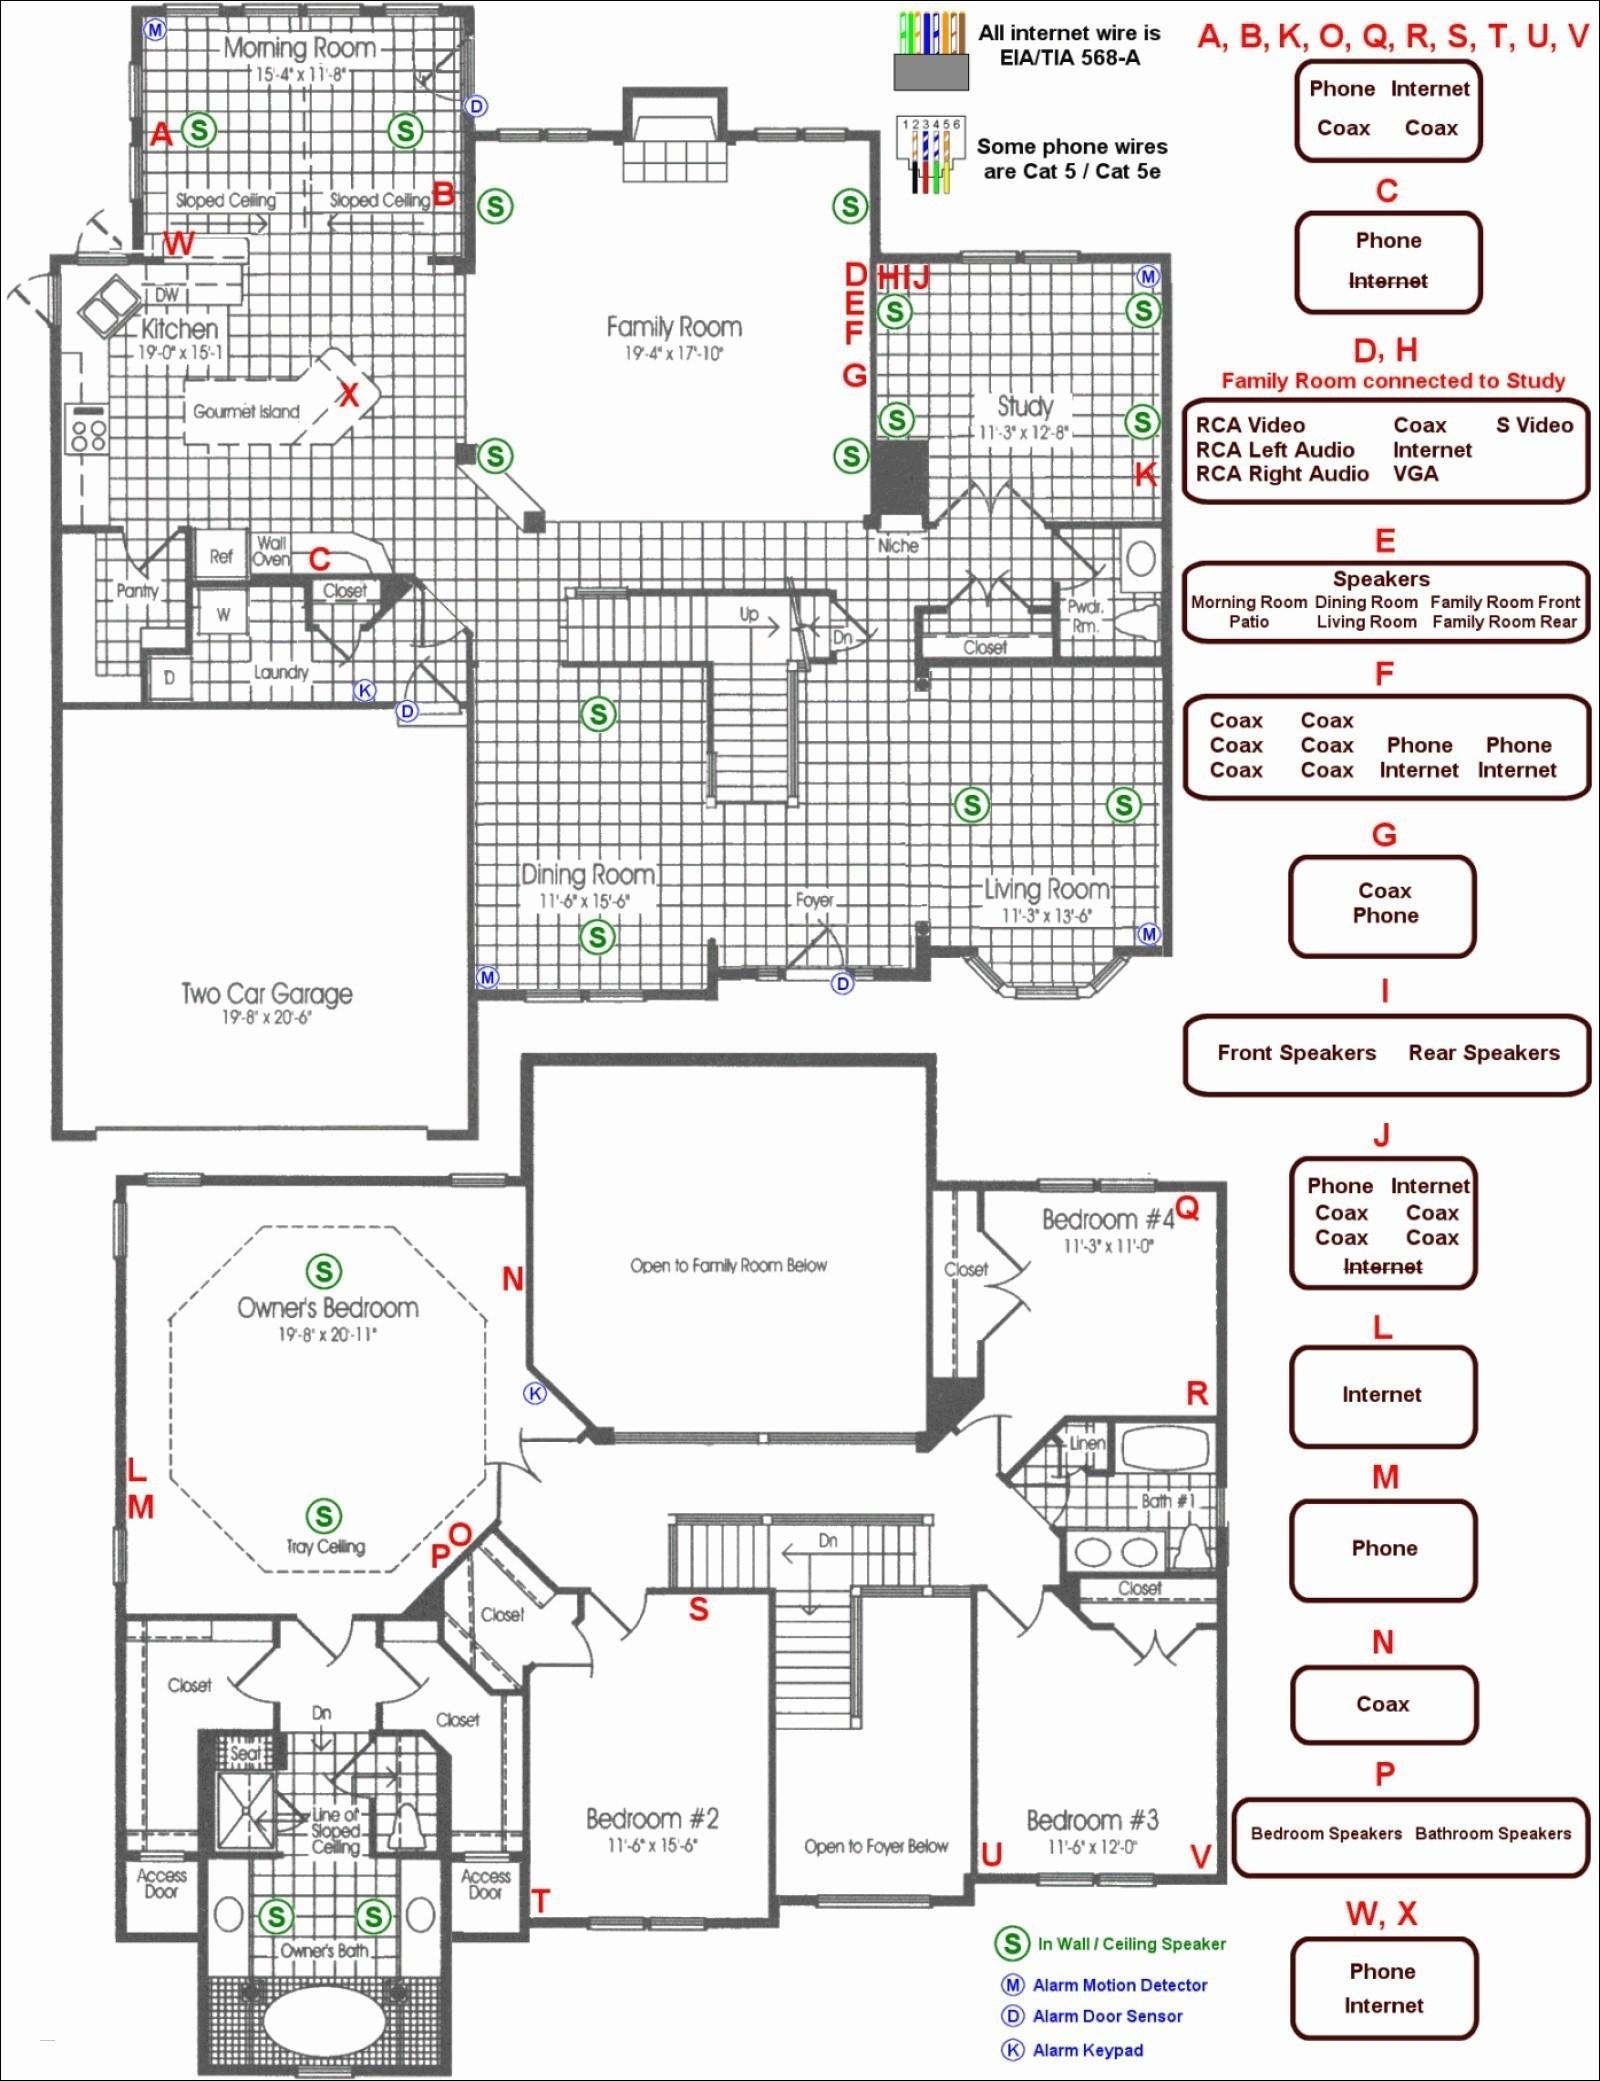 building wiring circuit diagram ke 6666  wiring diagram of commercial building free diagram  wiring diagram of commercial building